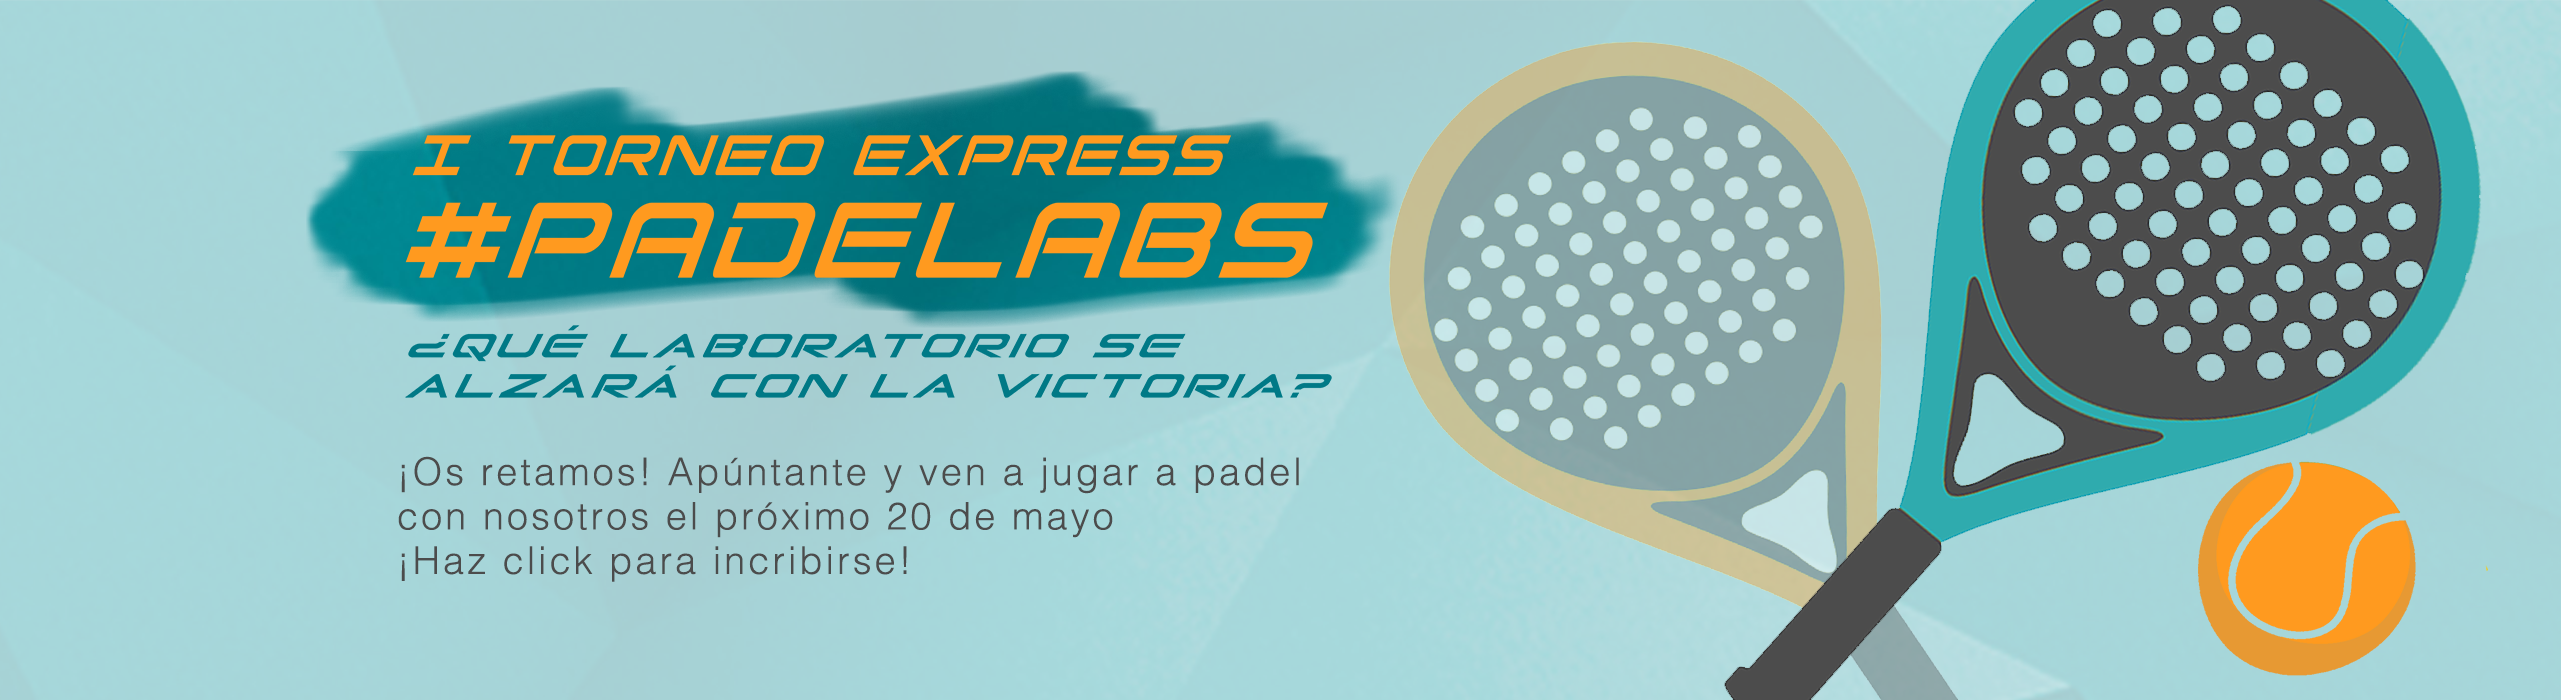 OHStrategy - I Torneo Express de Padel #PadeLabs